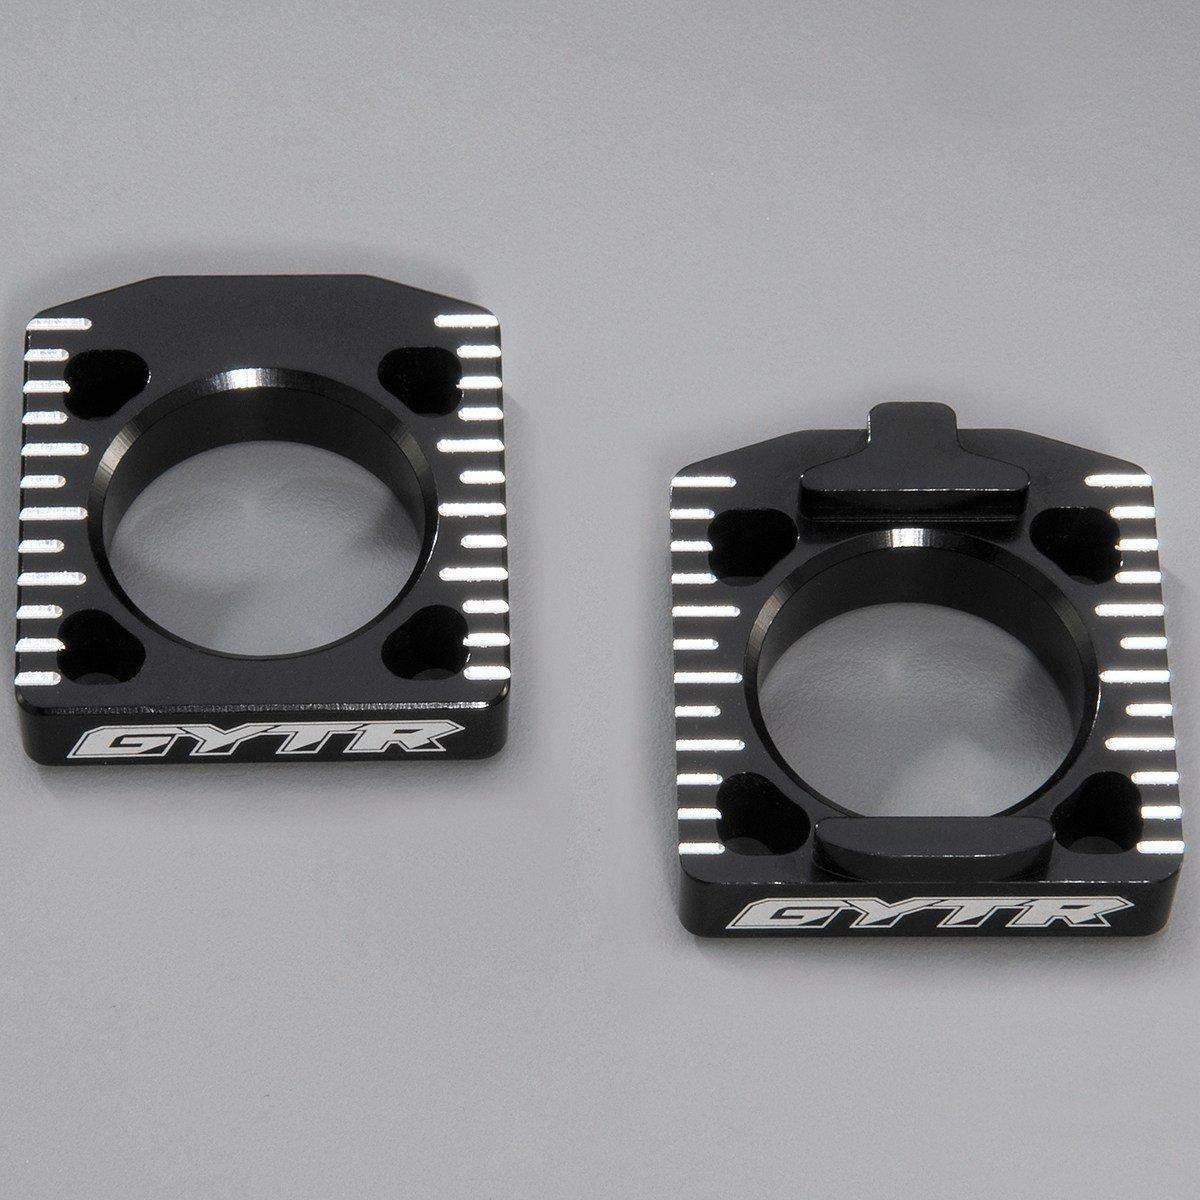 YAMAHA GYTR BILLET OFFSET AXLE BLACK BLOCKS YZ450F '10-'18-YZ250F '11-'15 33DF53M0T000 by Yamaha (Image #1)